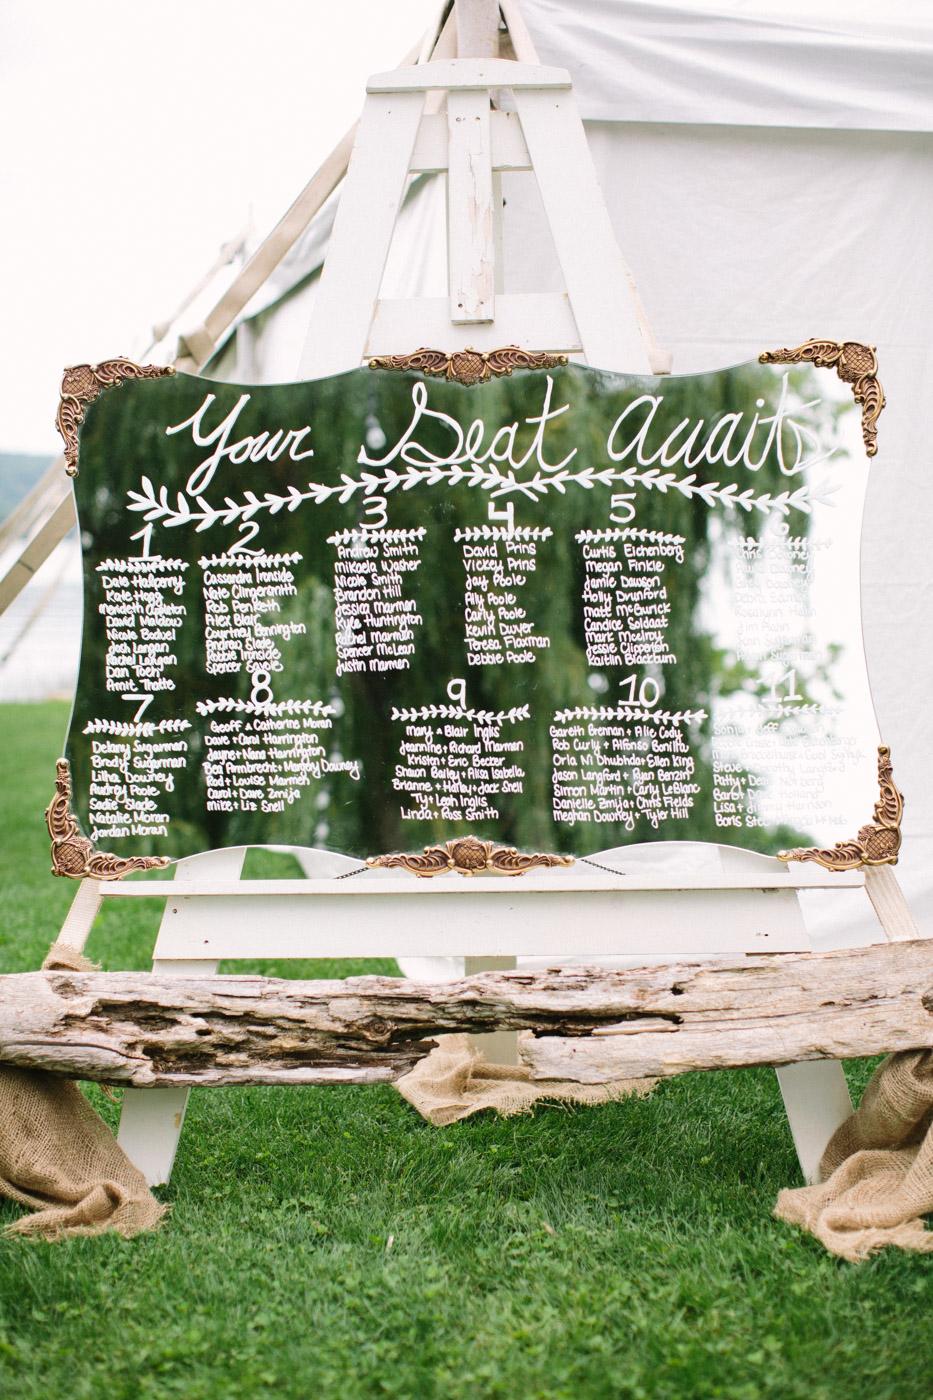 Backyard_collingwood_waterfront_diy_wedding-10.jpg